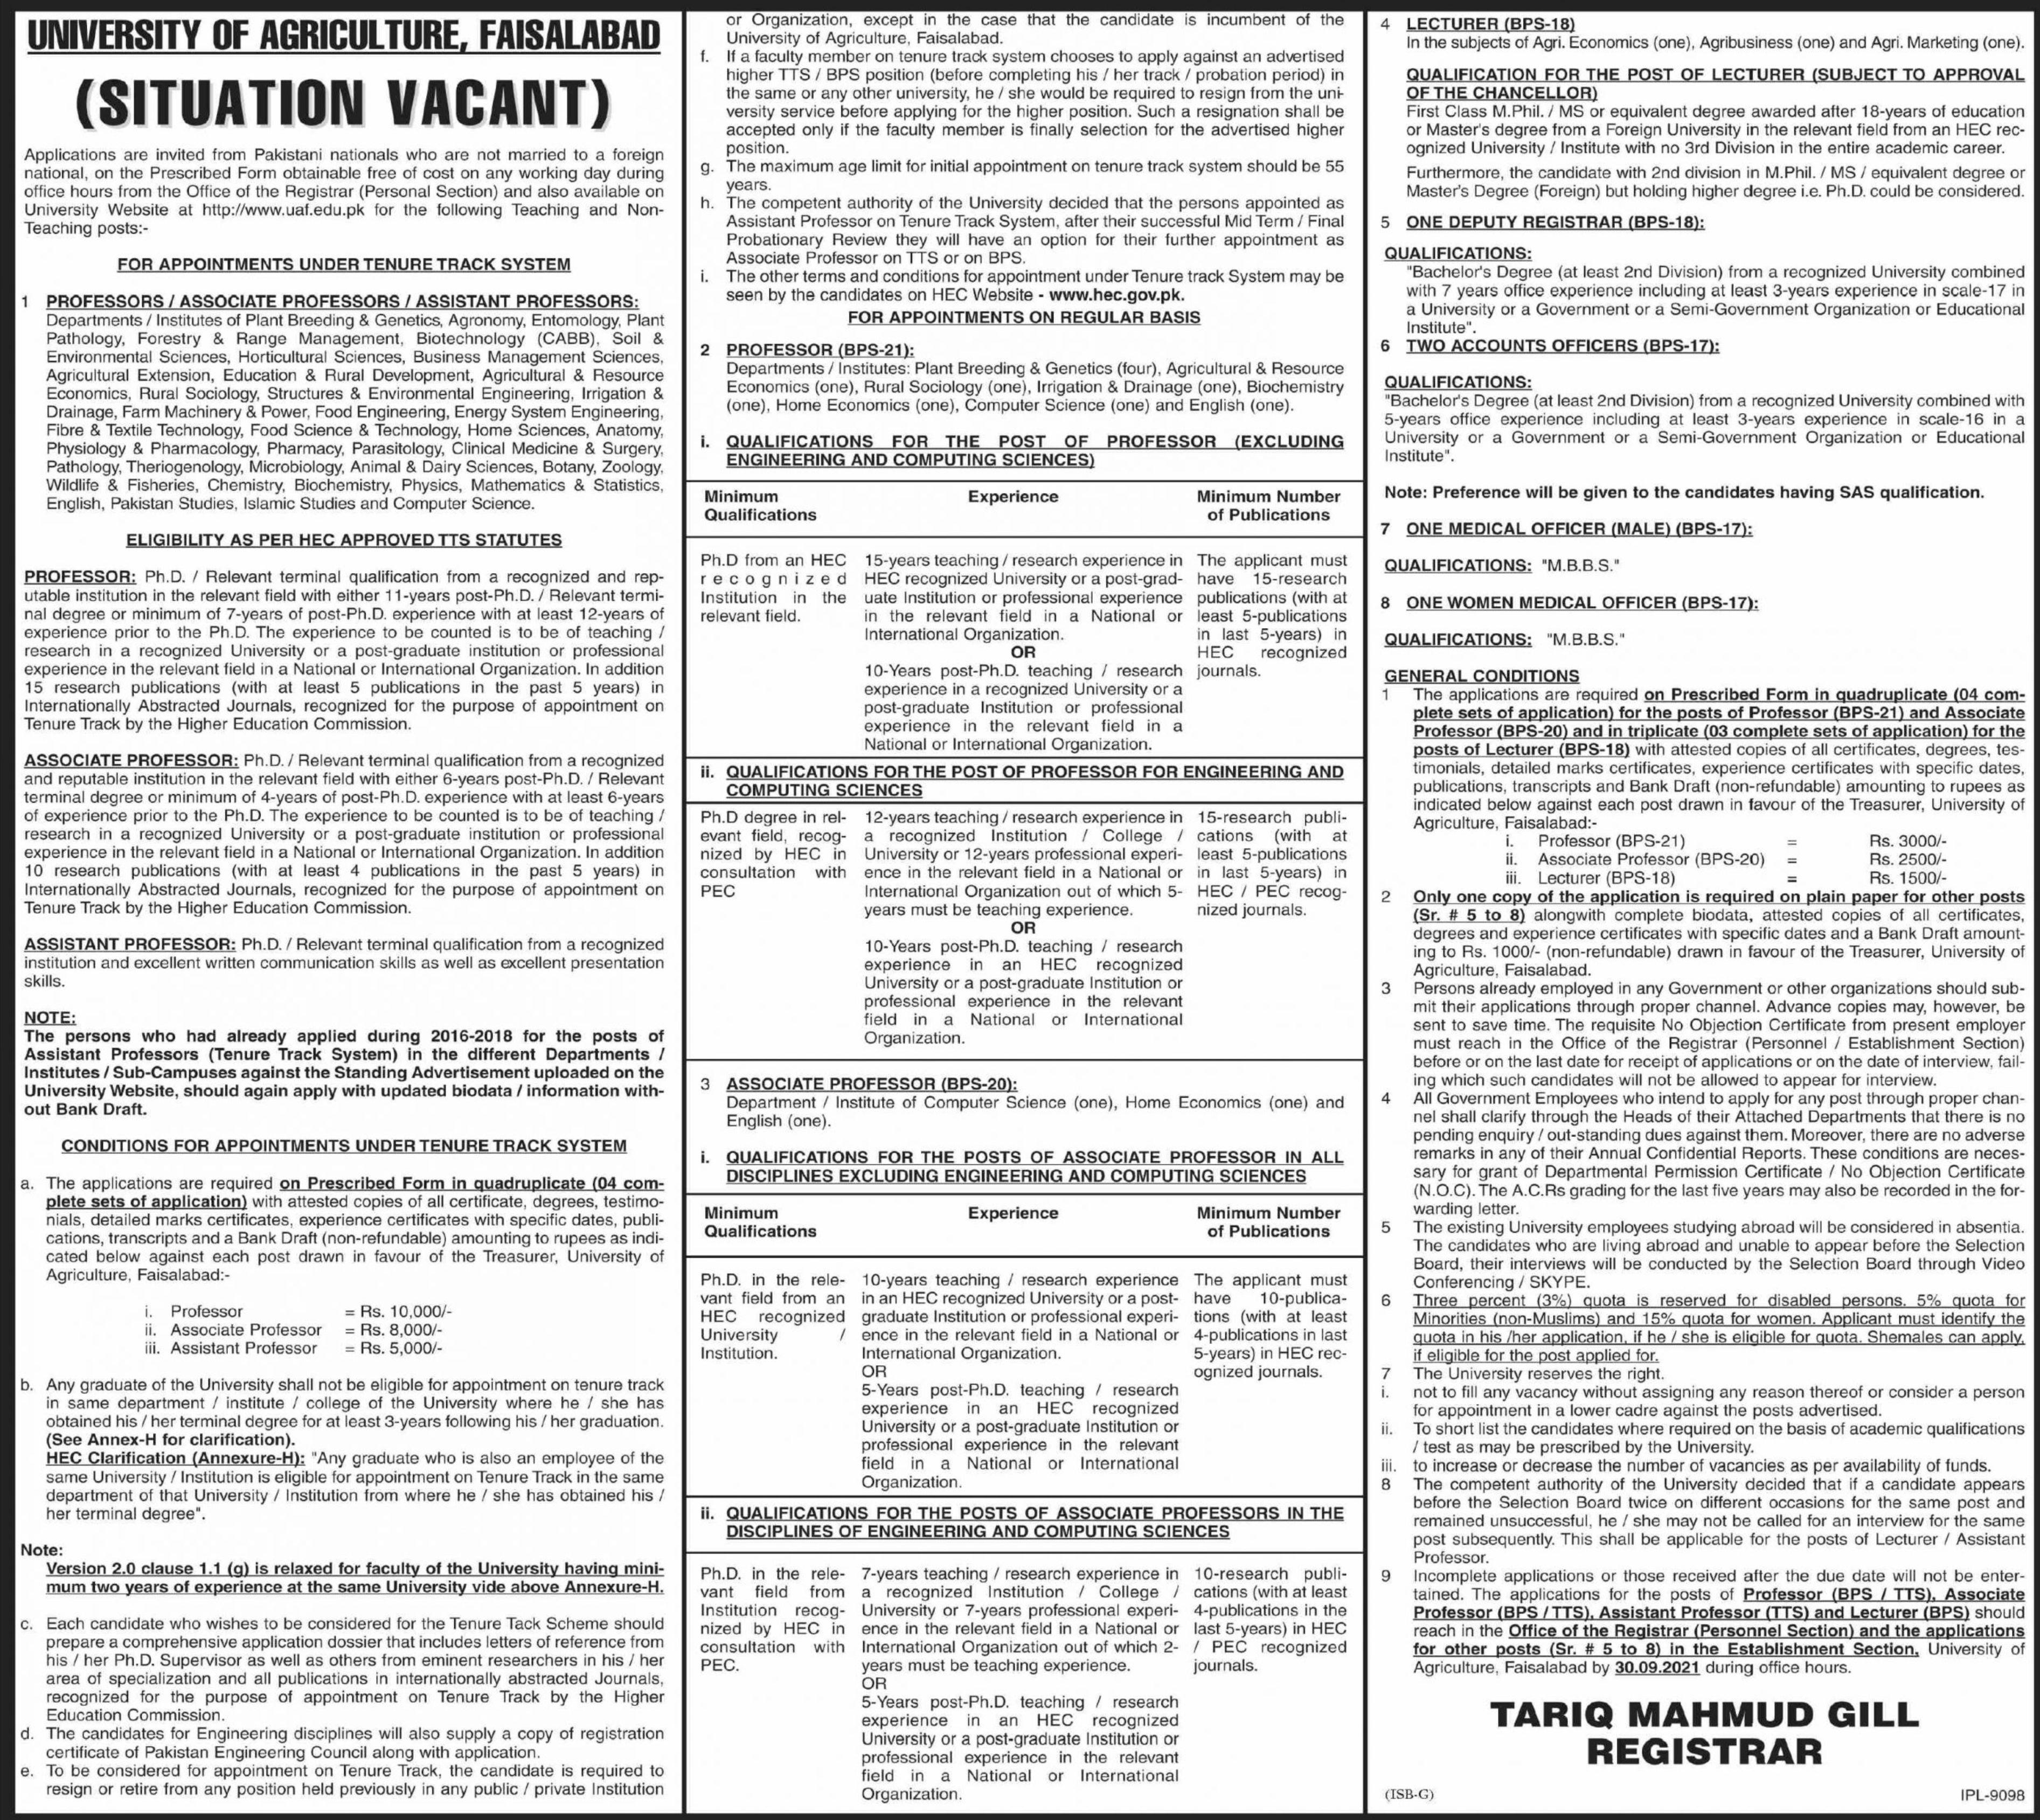 University of Agriculture Faisalabad Vacancies 2021 3